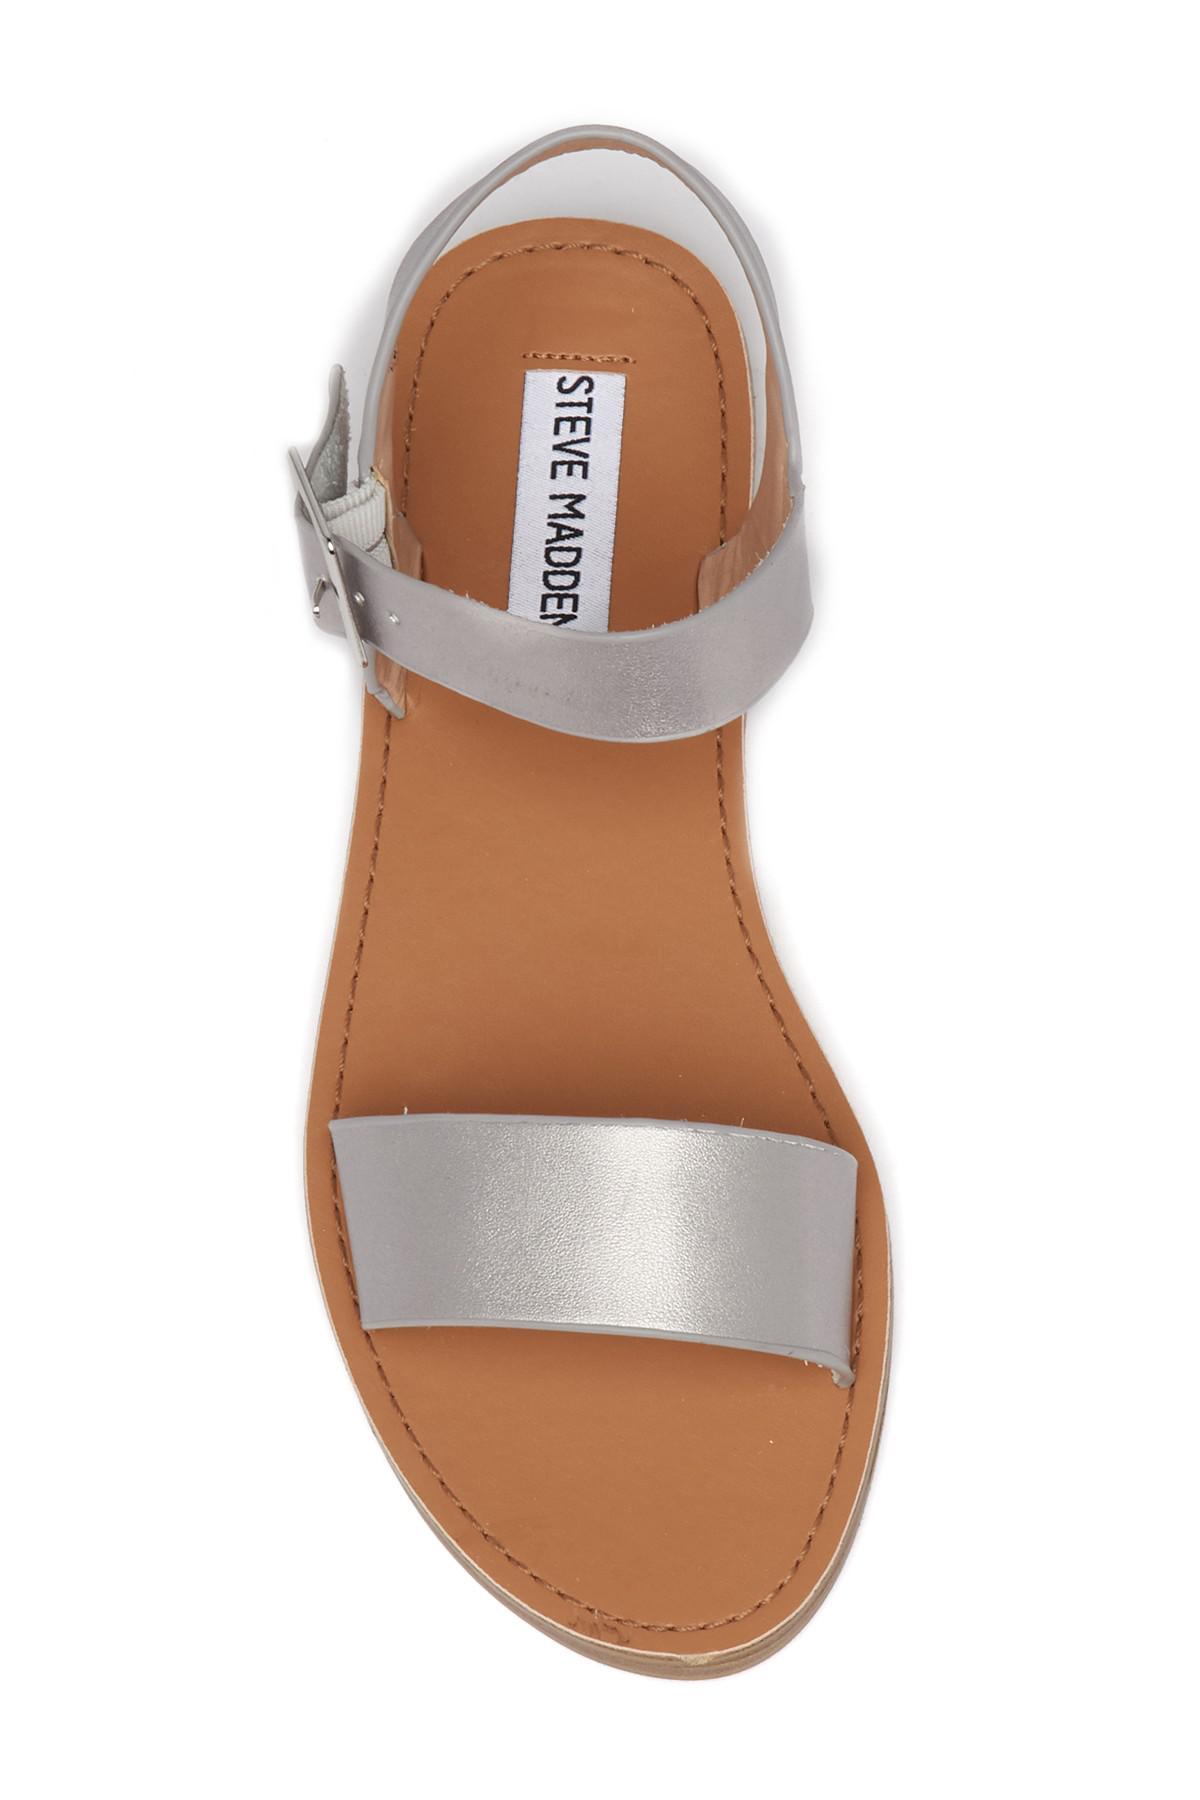 5be44a77fad Steve Madden Zone Ankle Strap Sandal in Metallic - Lyst